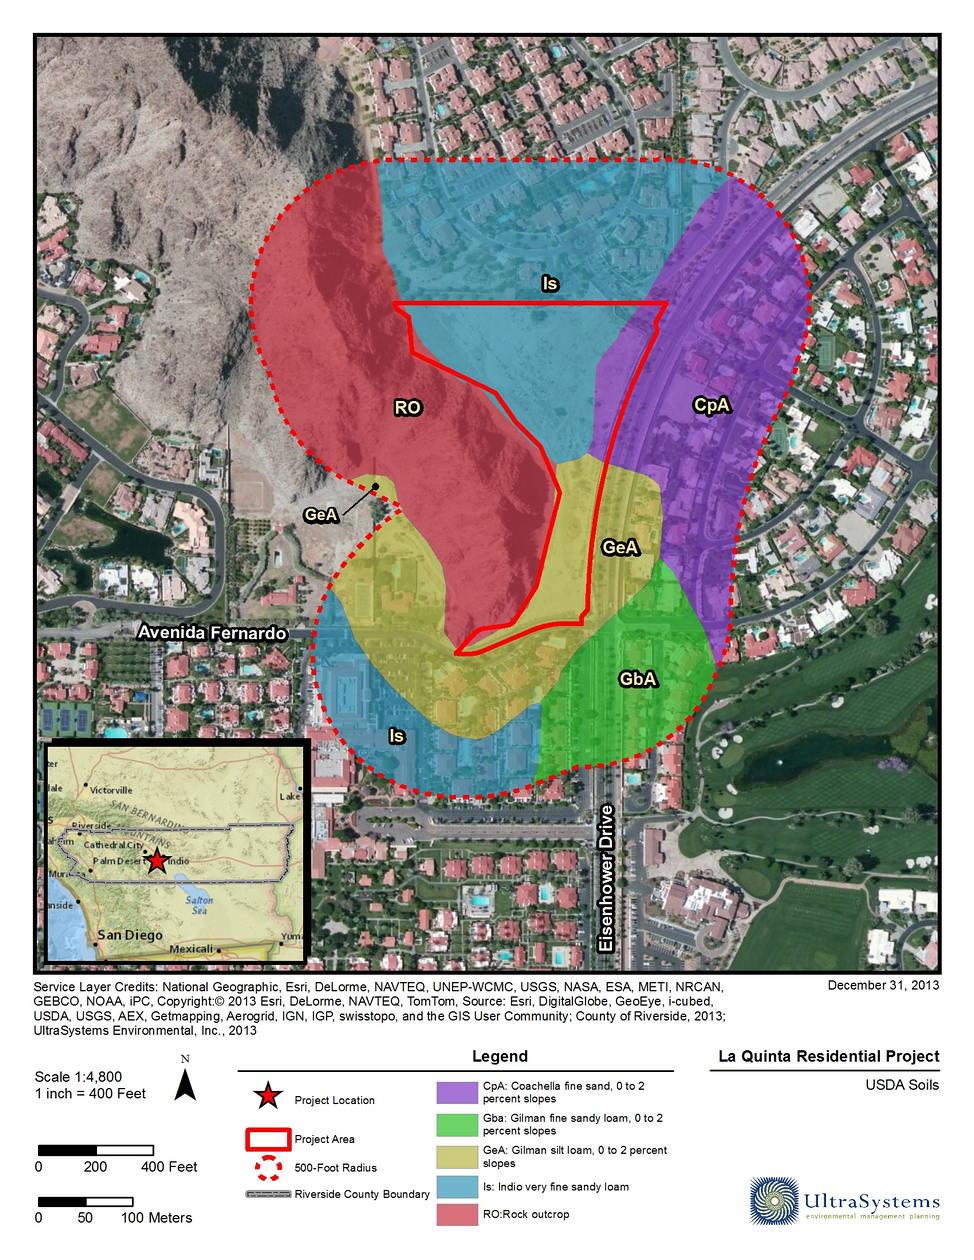 La Quinta Single-Family Detached Homes